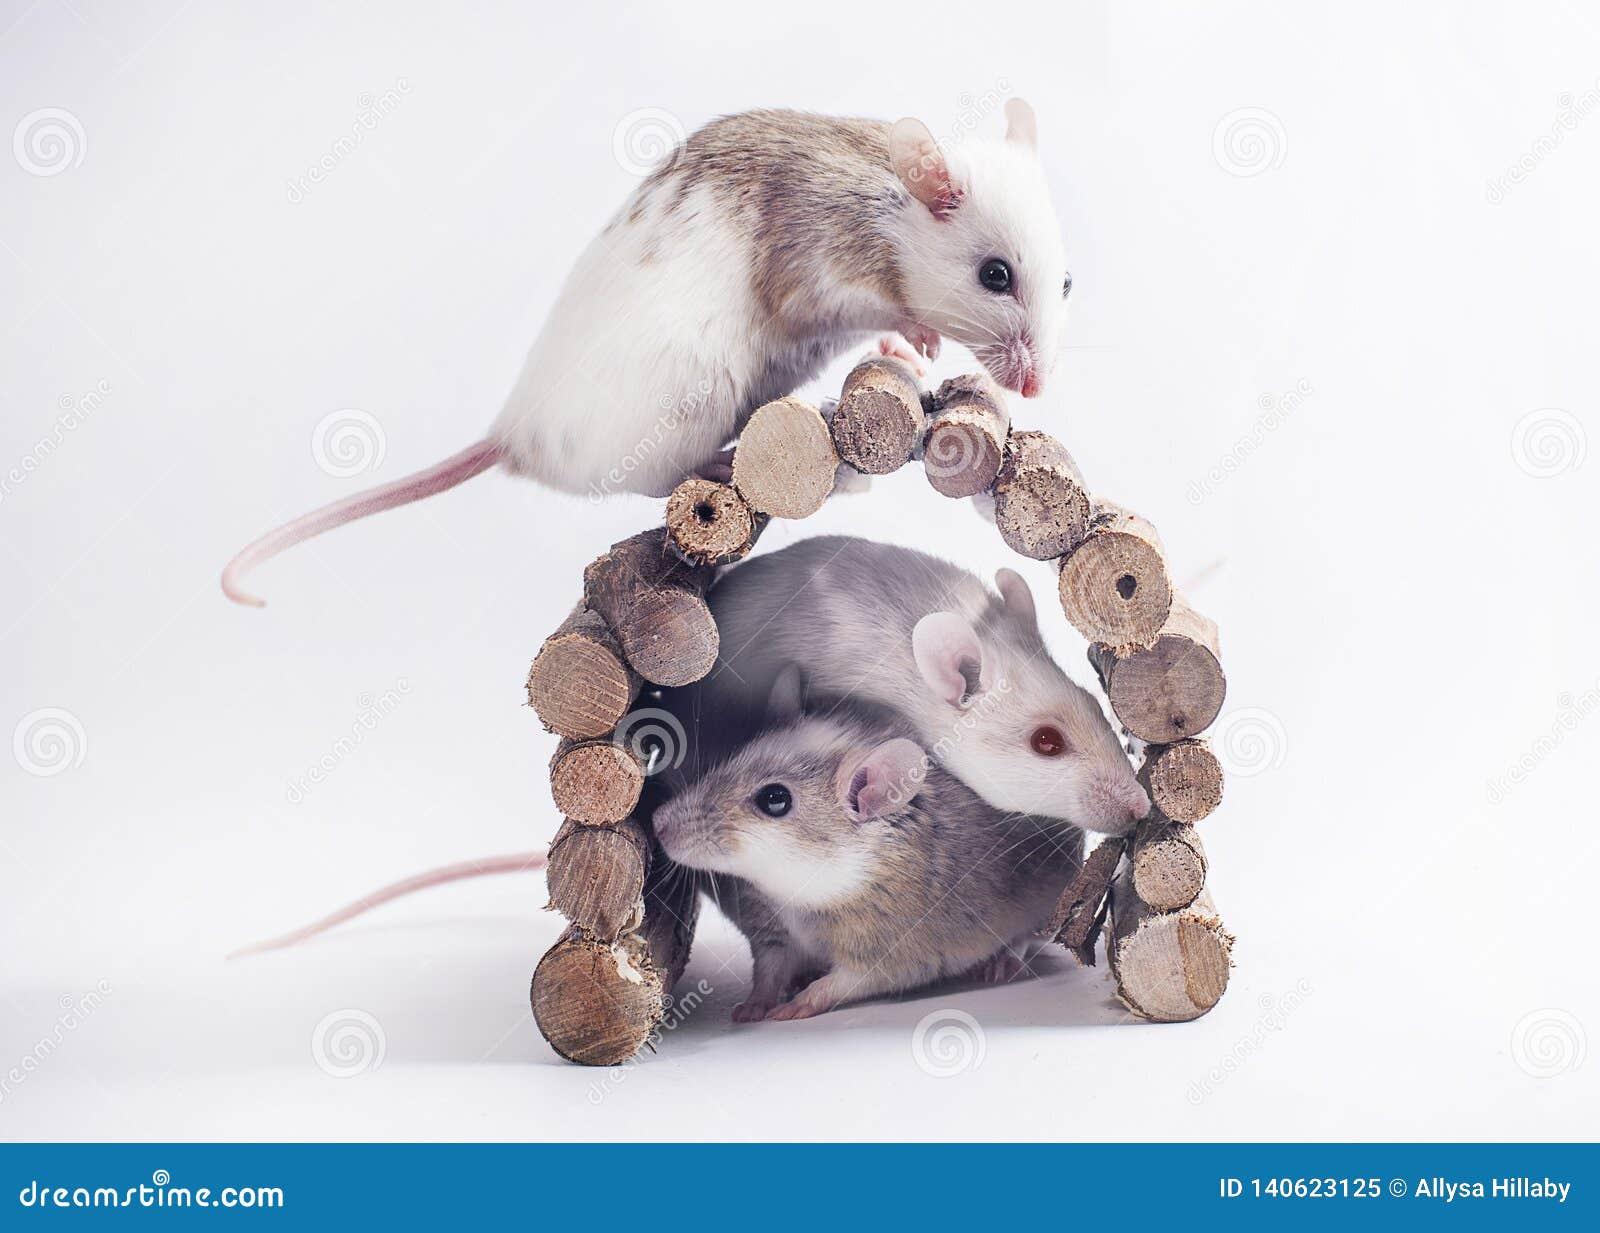 3 mice on white backdrop